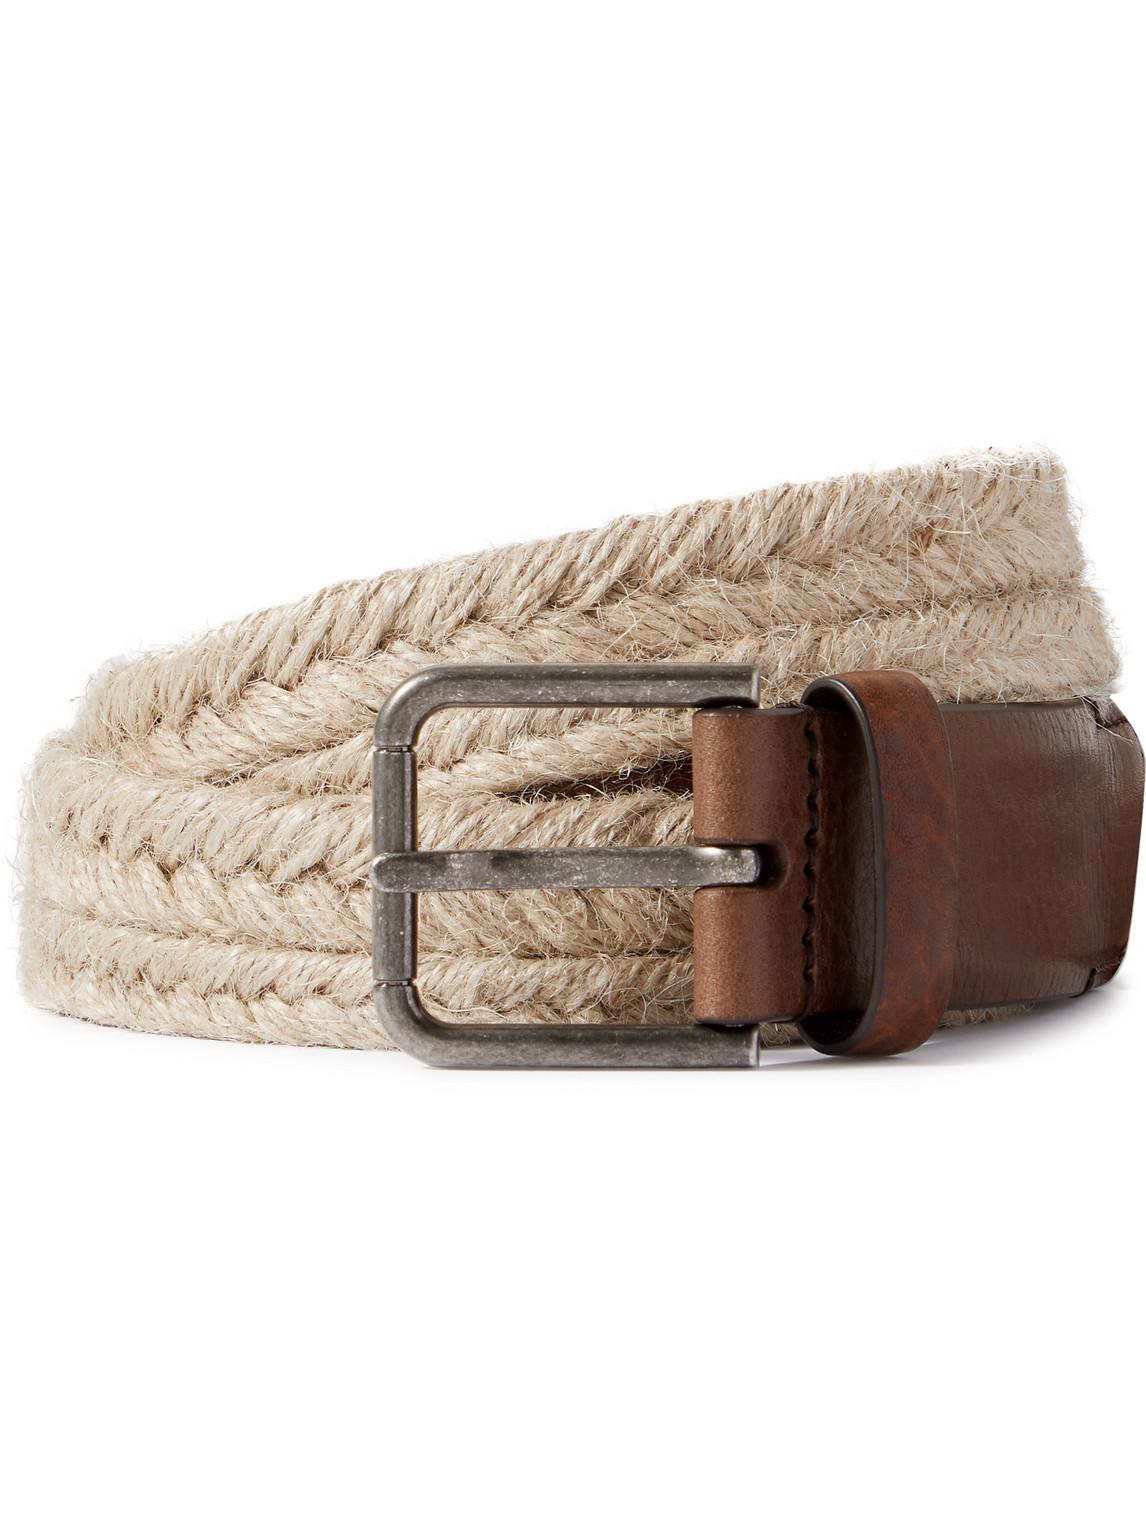 Dolce & Gabbana Belts 3CM LEATHER-TRIMMED WOVEN ROPE BELT